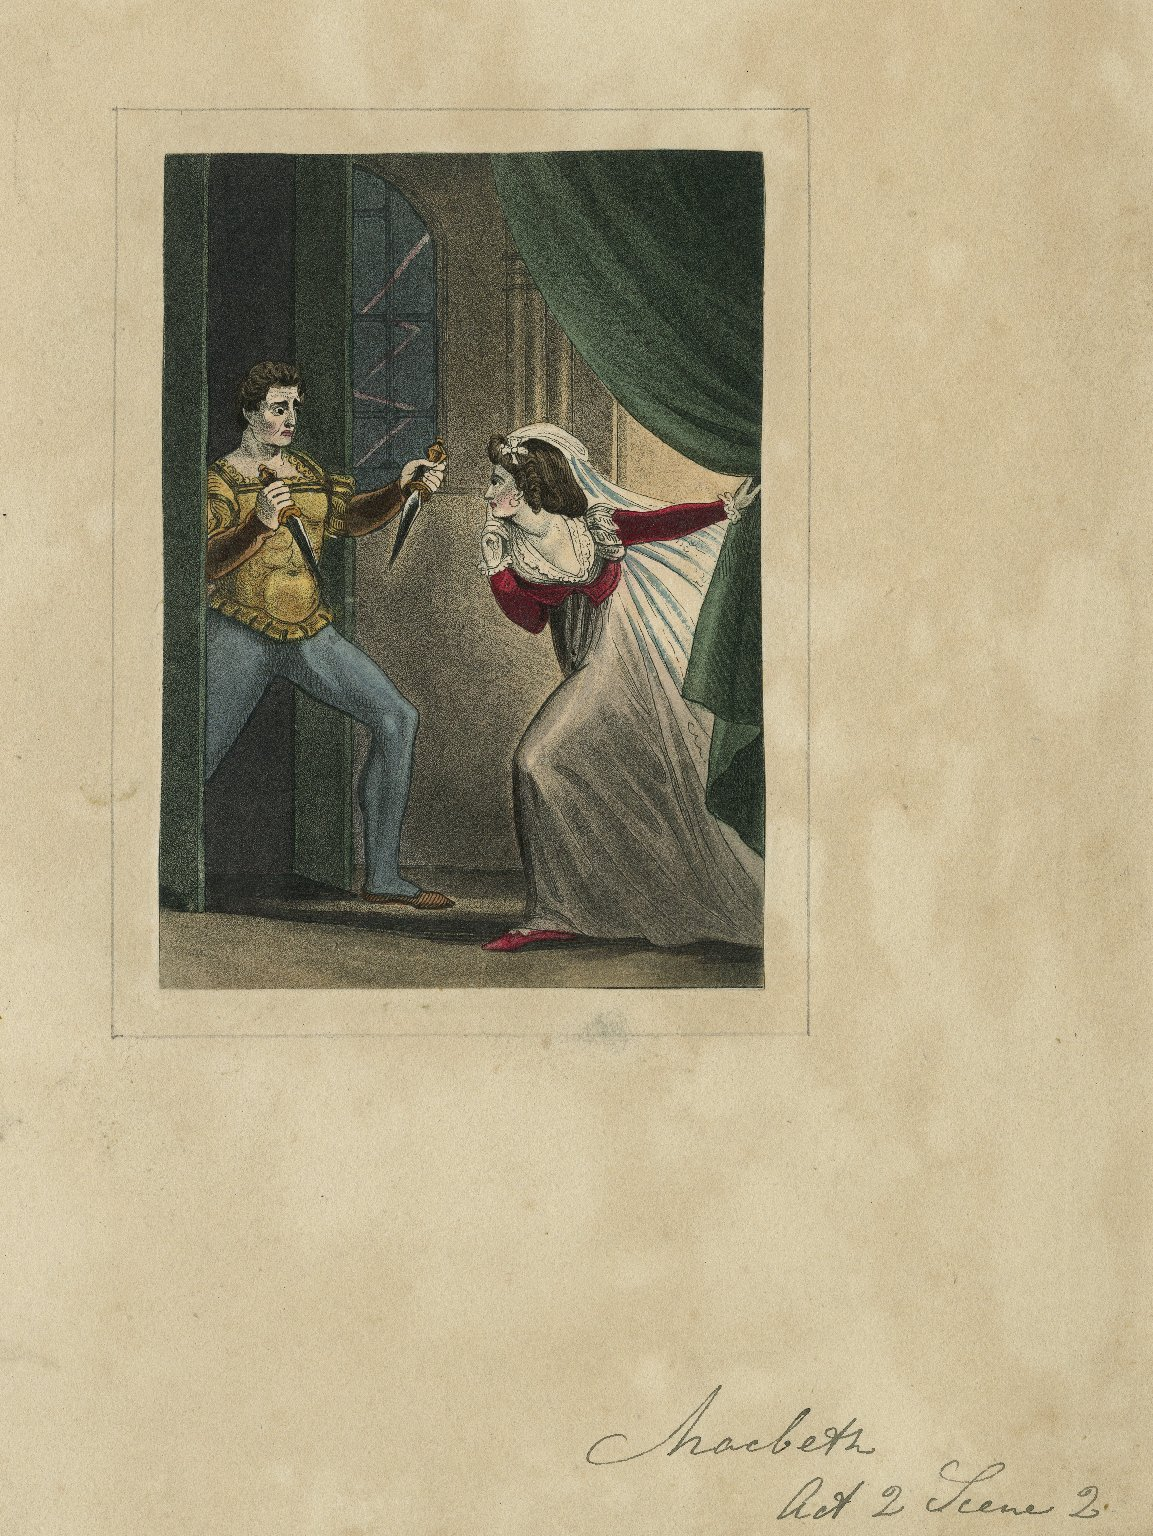 Macbeth, act 2, scene 2 [graphic].